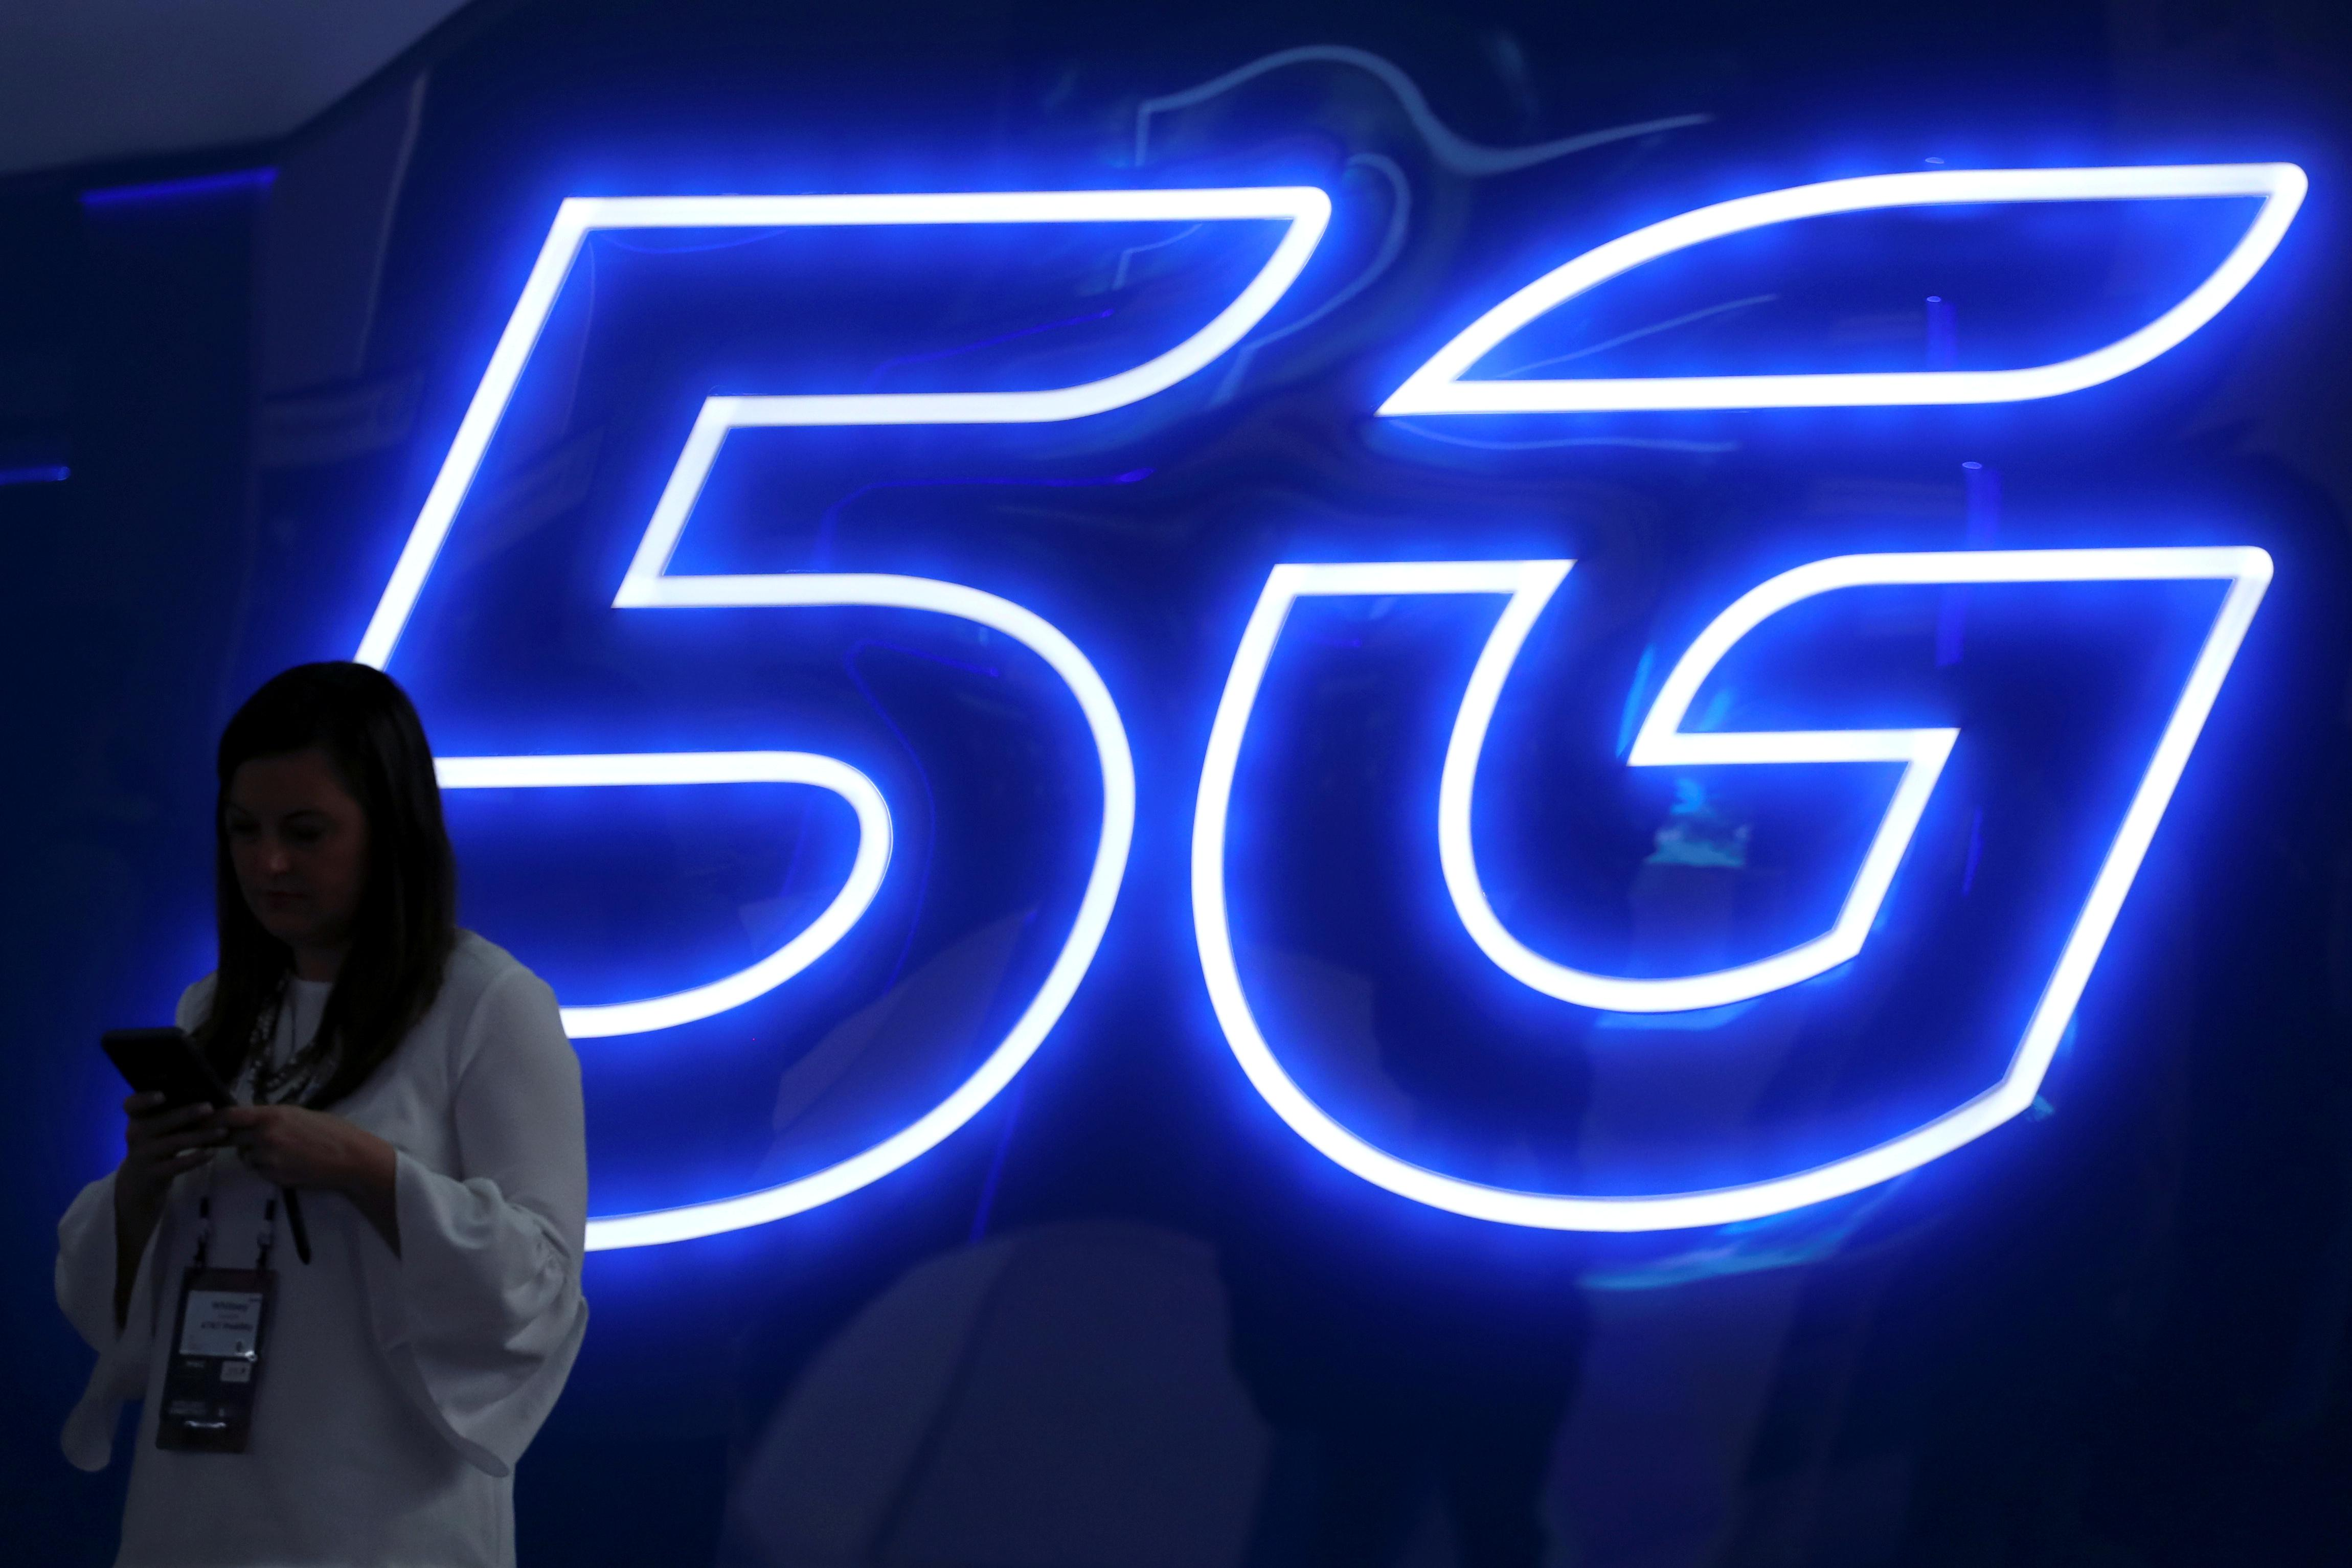 USA, China, Japan and Korea to dominate 5G: study